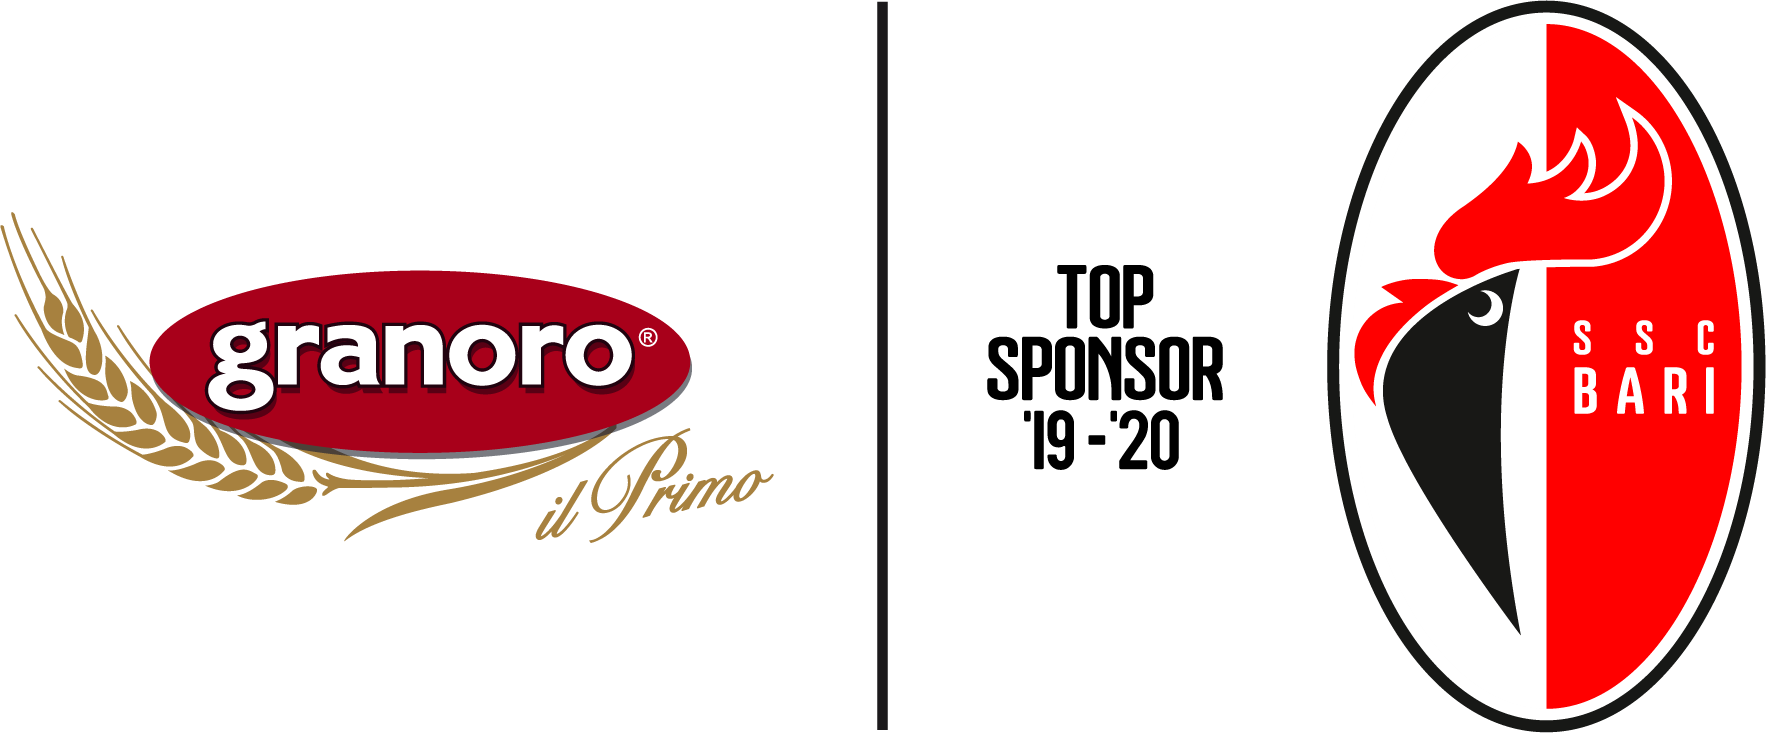 Granoro - Bari